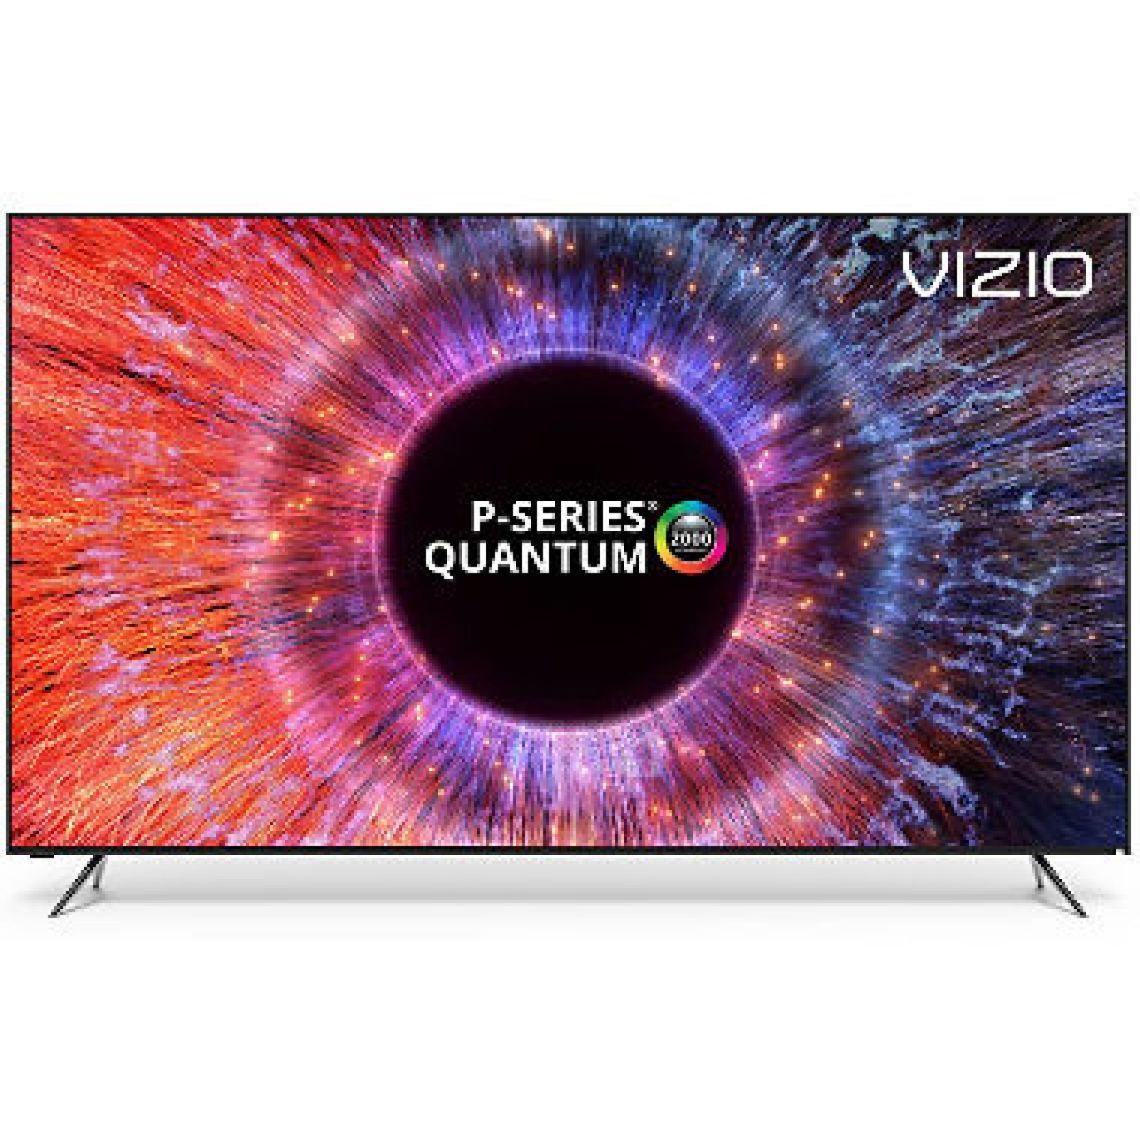 "VIZIO P-Series® Quantum 65"" Class 4K HDR Smart TV - PQ65-F1 - Sam's Club"